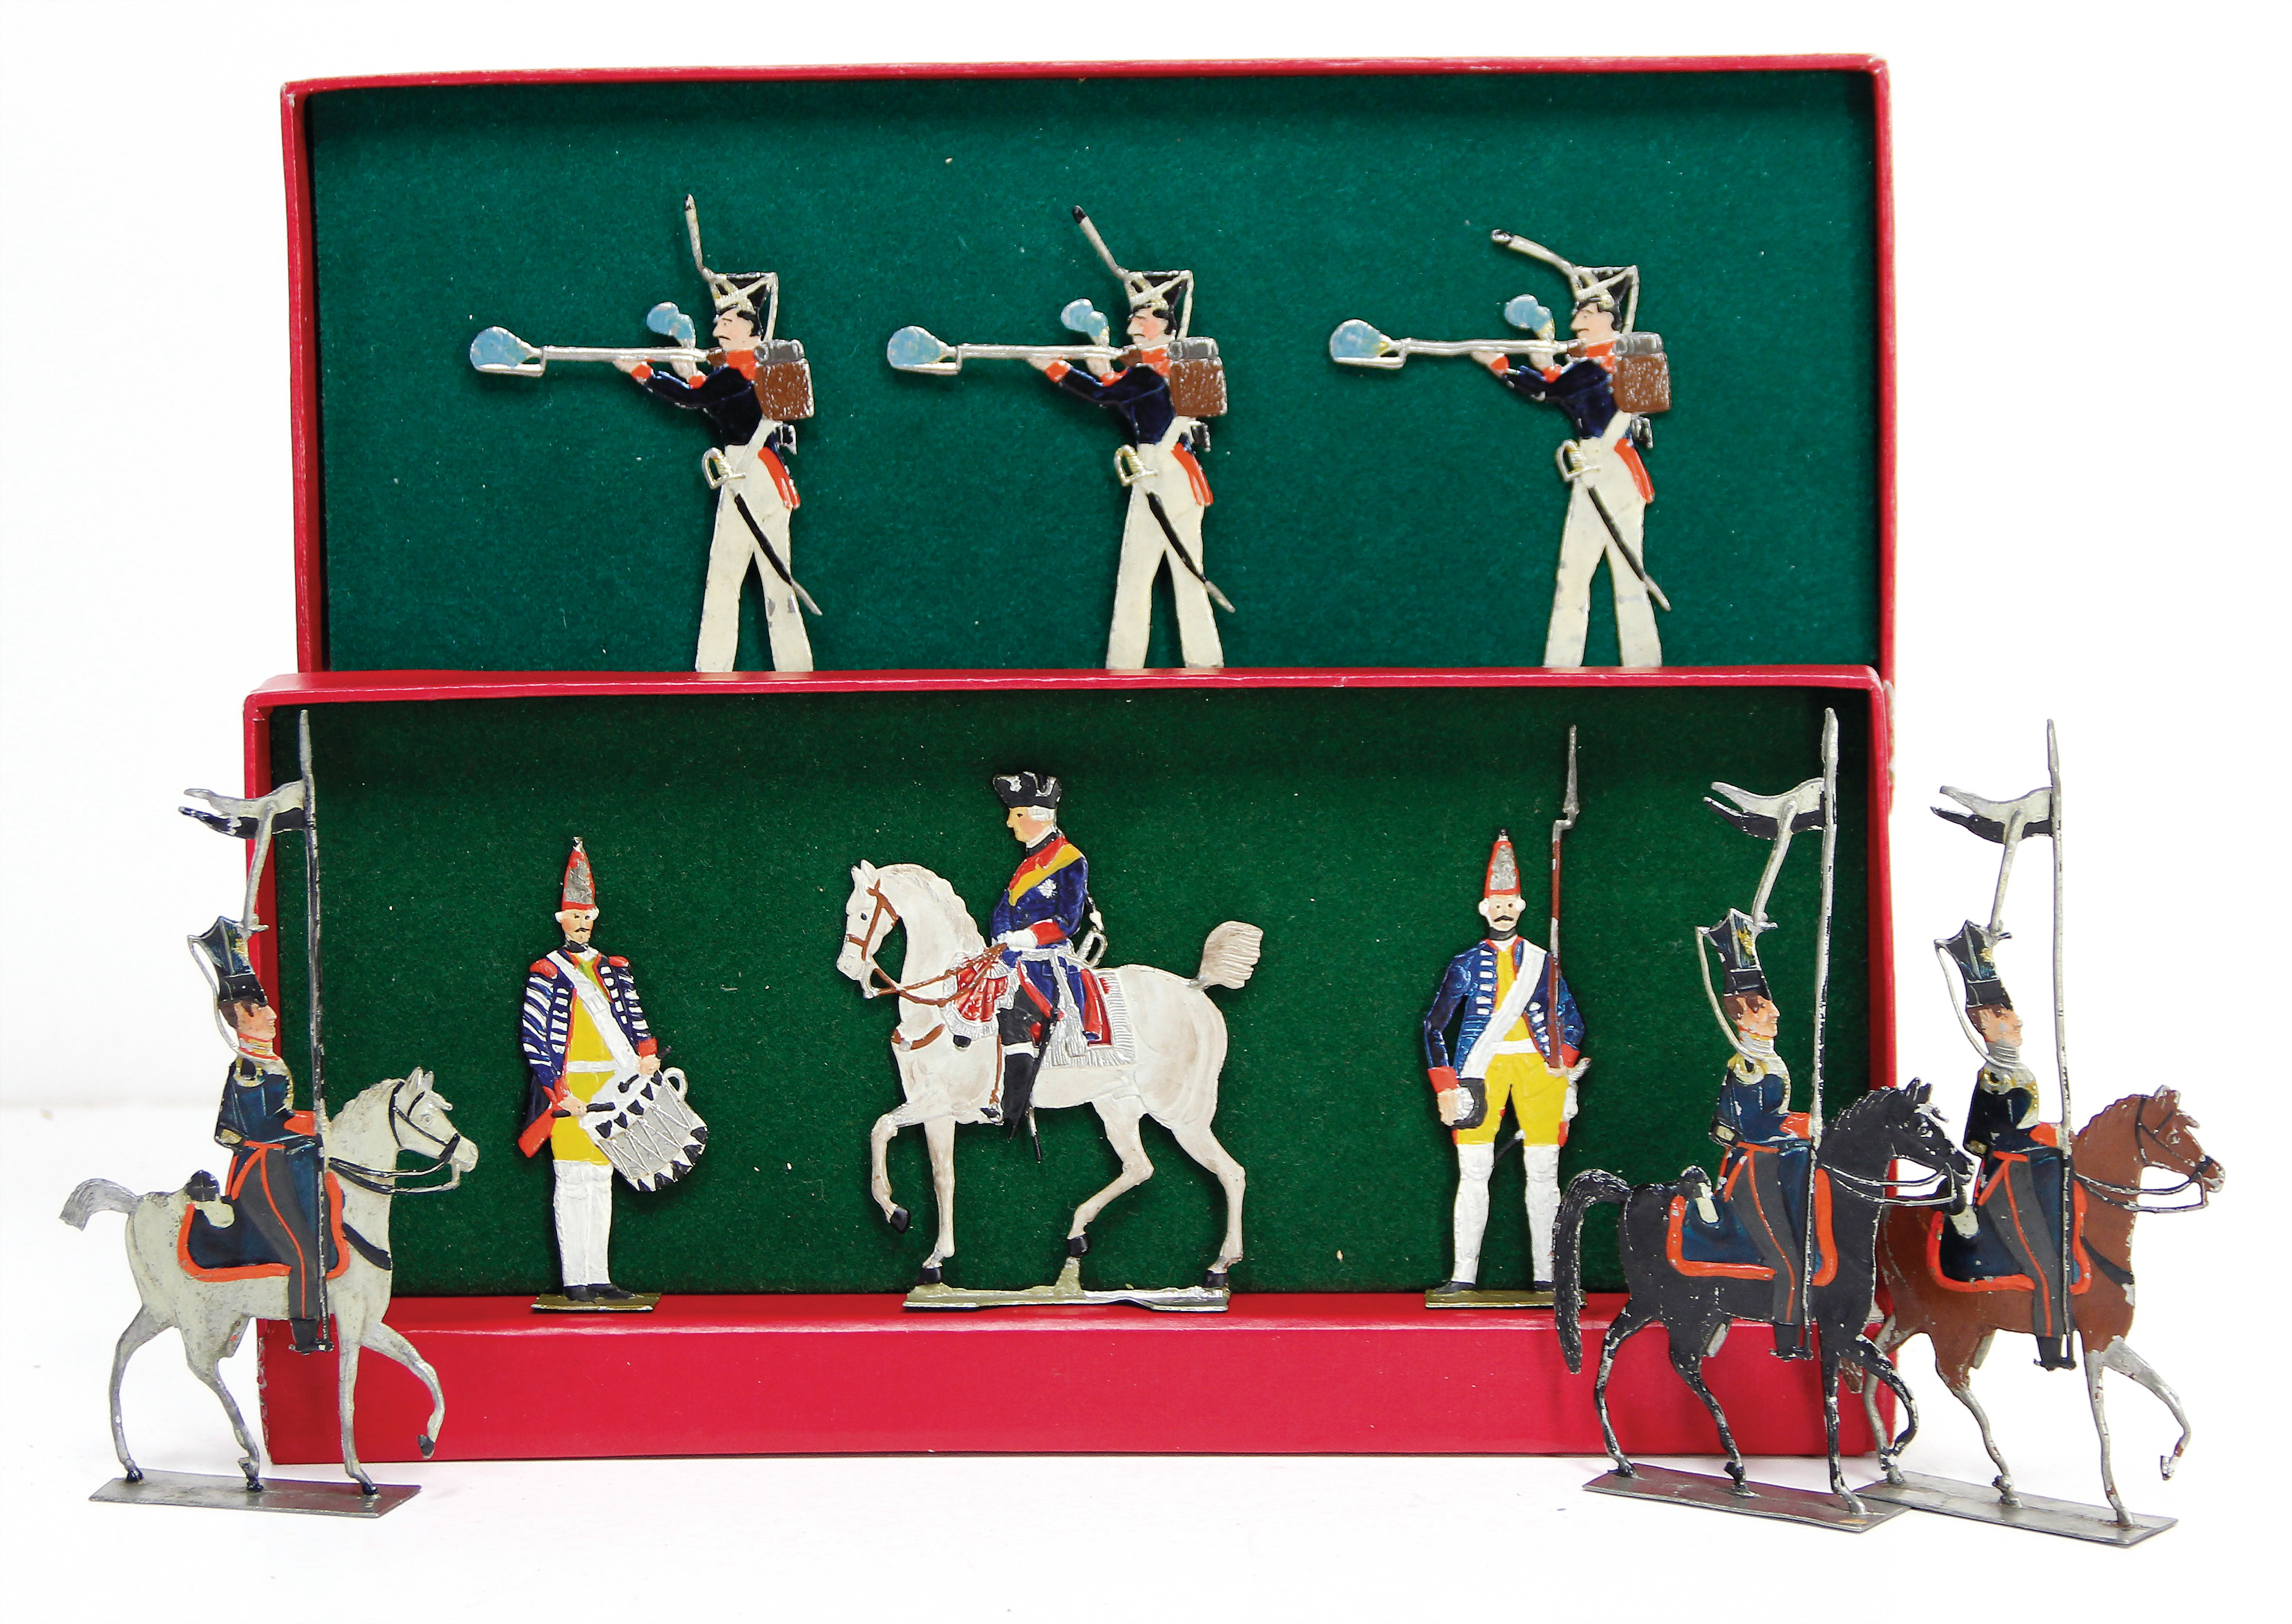 Art Deco Antik Stil Regalwinkel Wandkonsolen LB H/&F 2 St/ück Regaltr/äger Set Gusseisen Massive schwere Qualit/ät